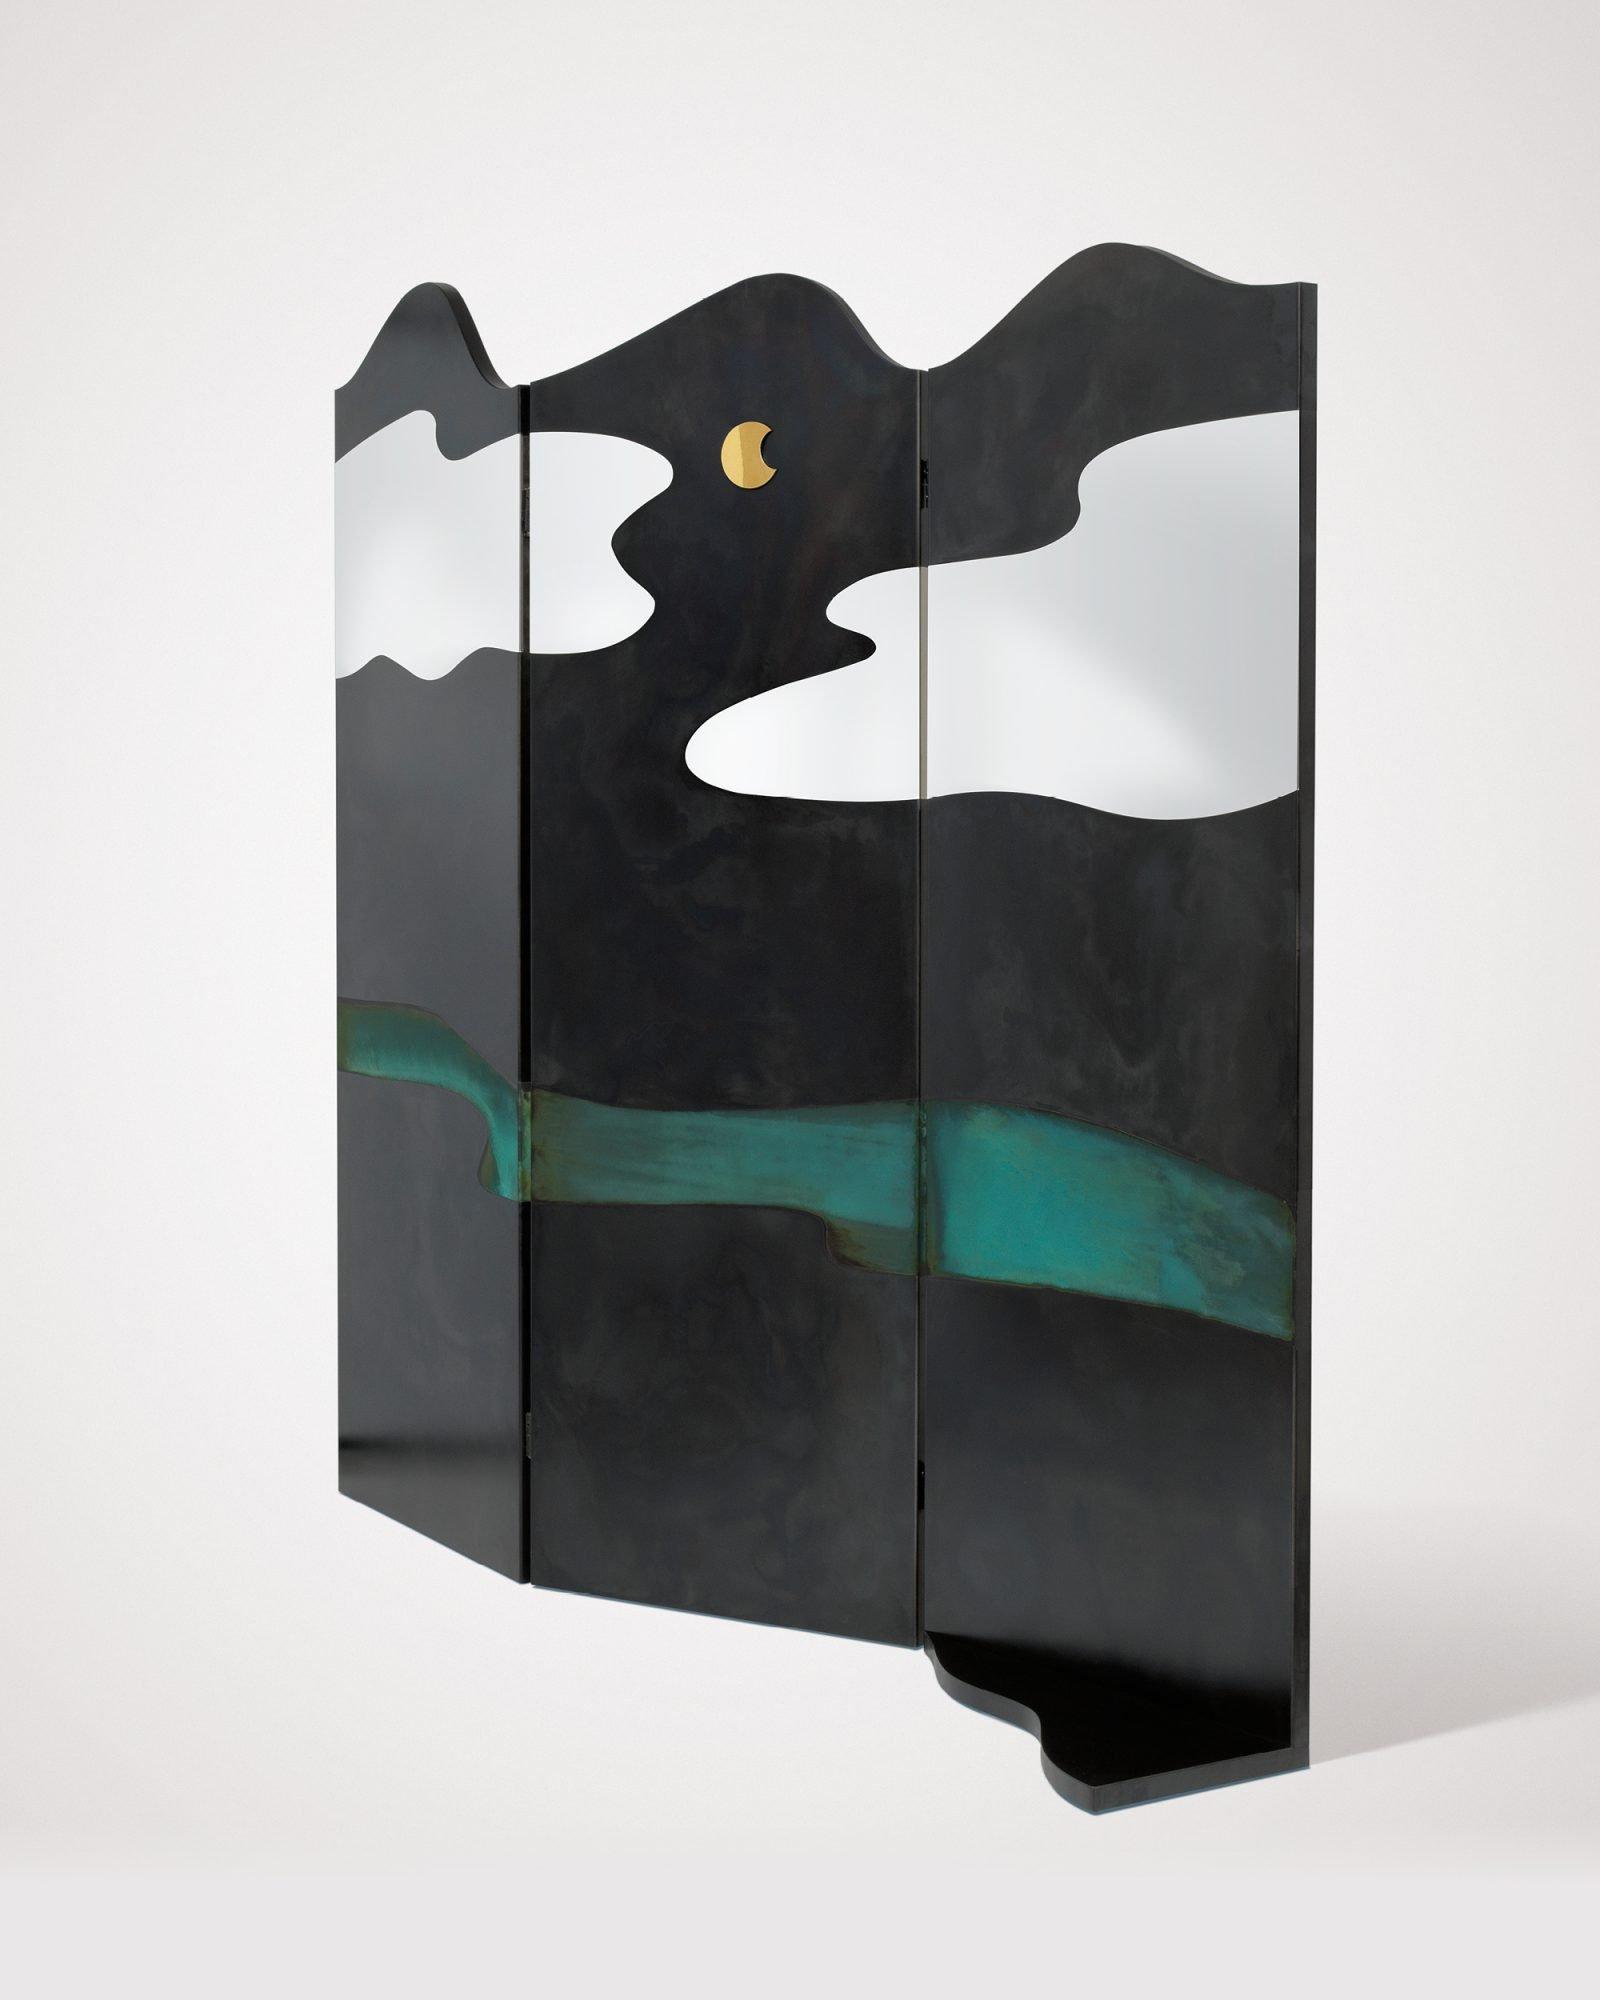 Painting Curtain art from De Castelli, designed by Alessandra Baldereschi